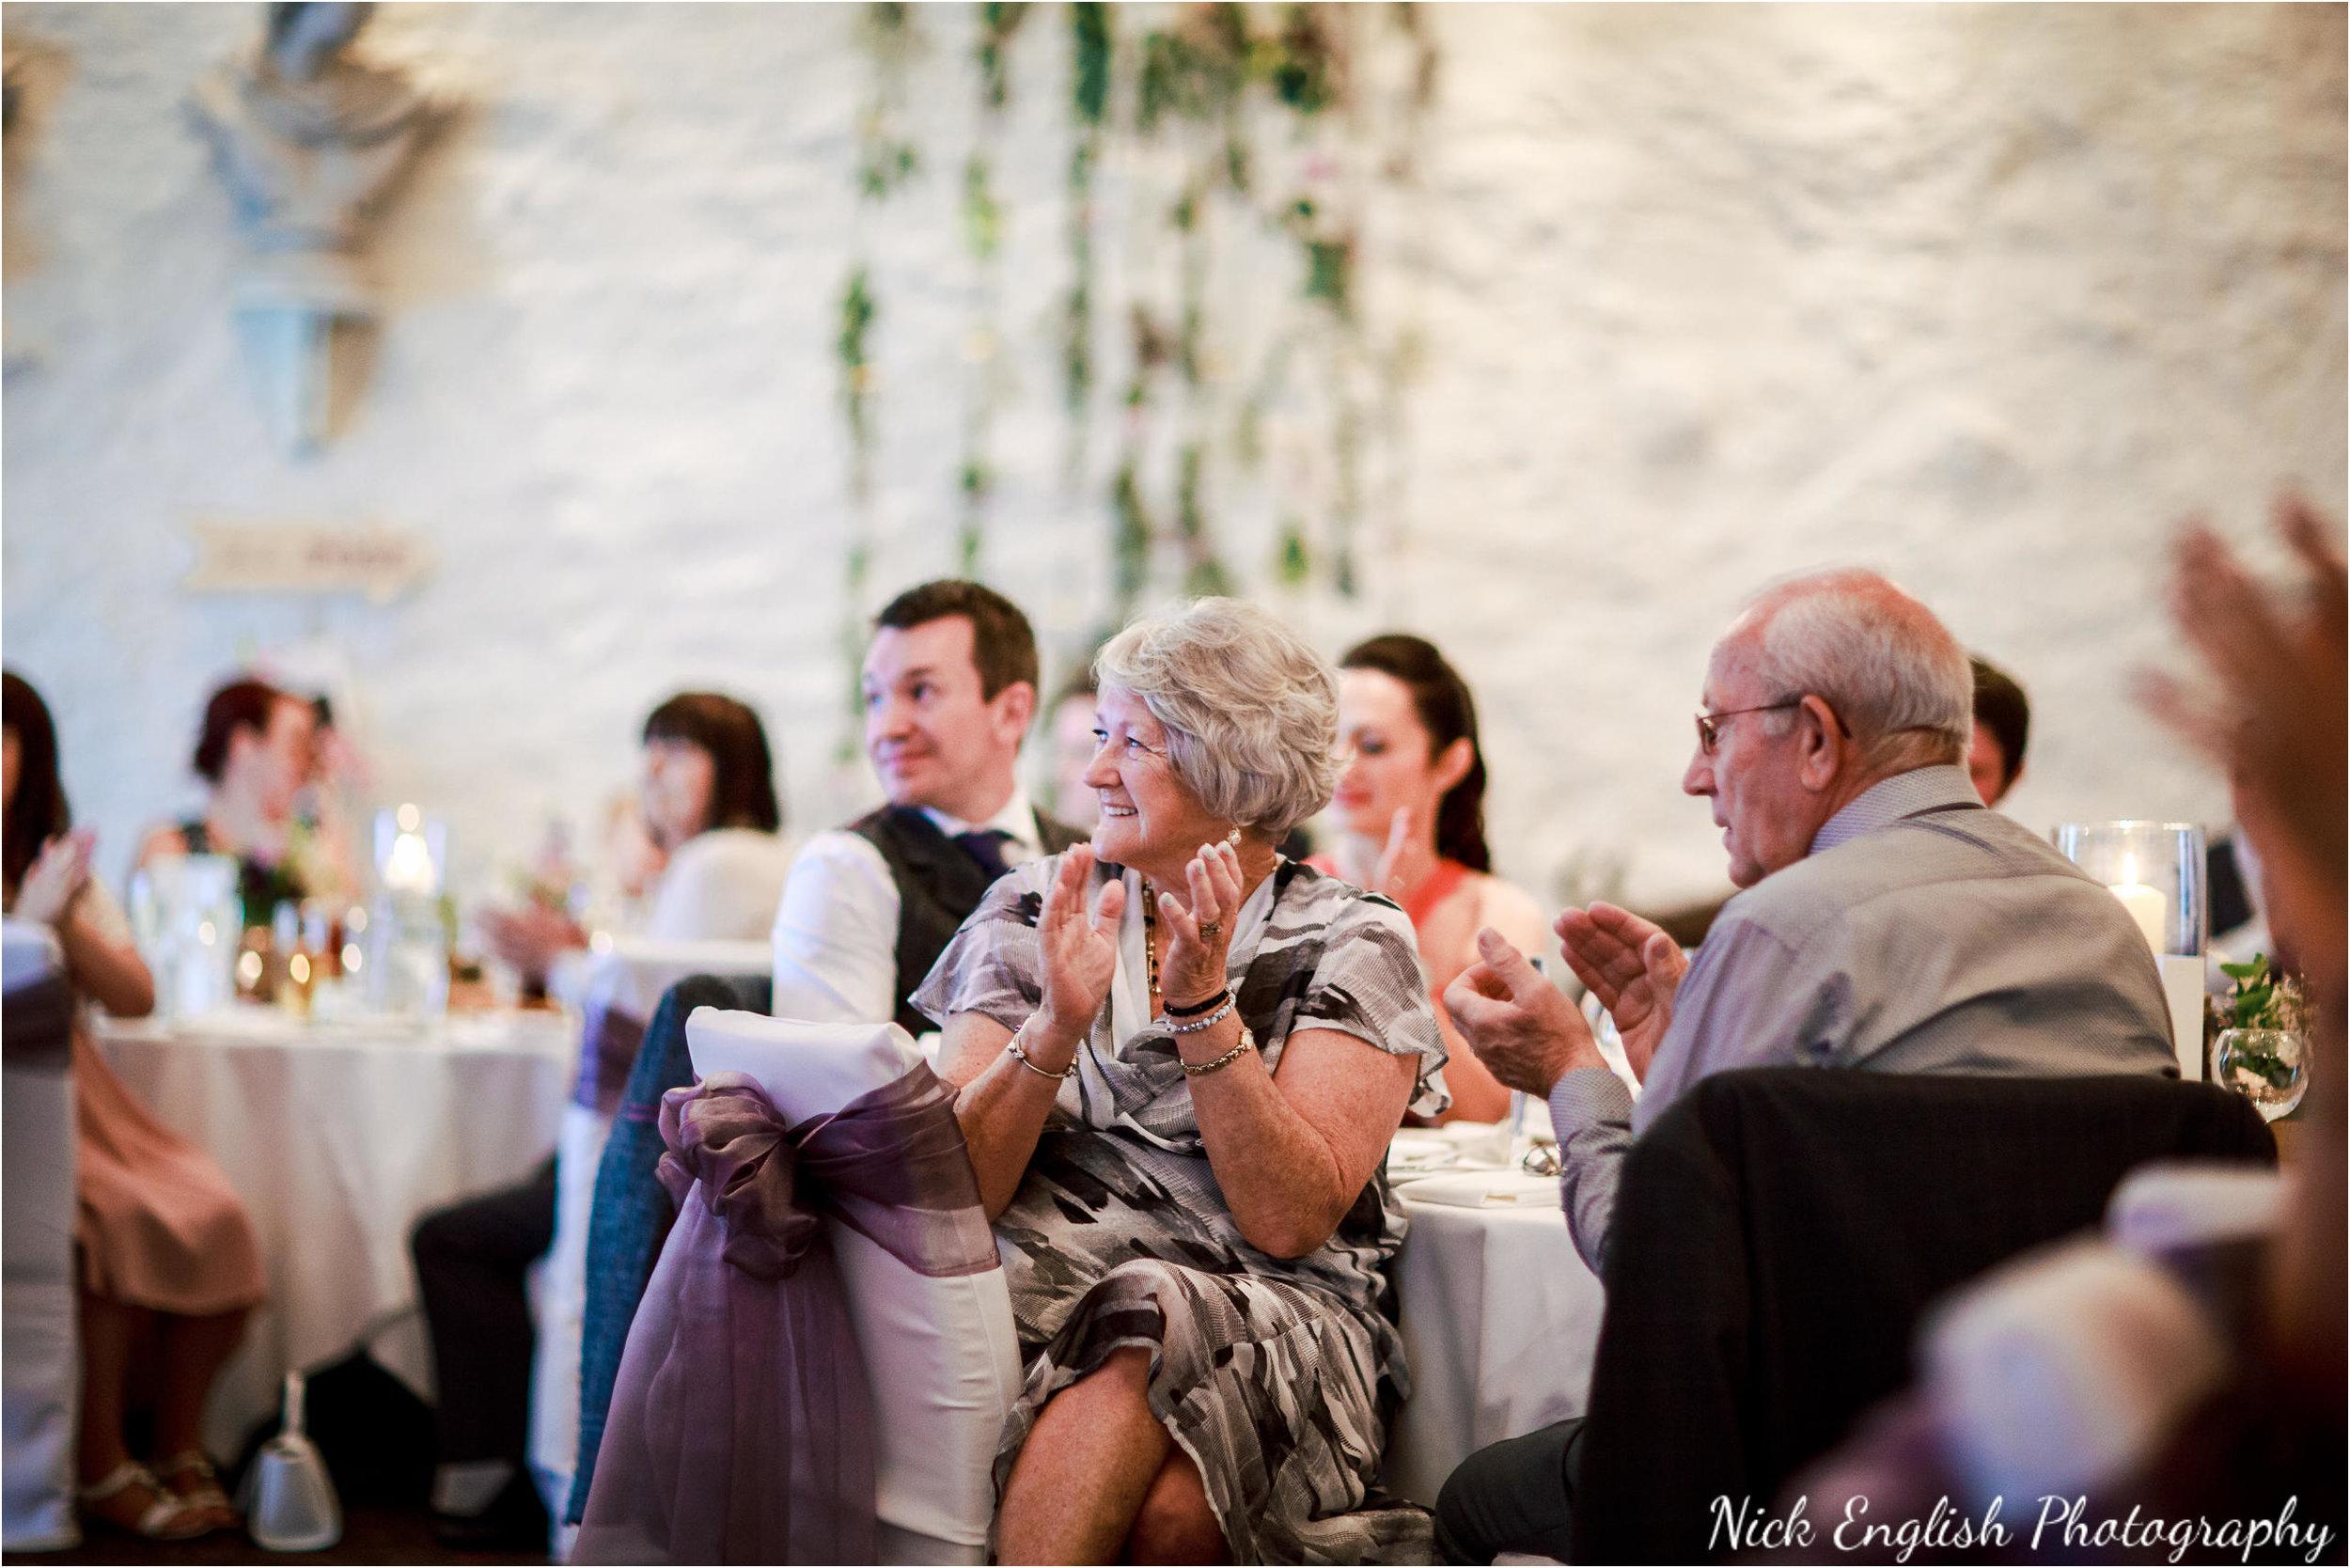 Stacey-Ash-Wedding-Photographs-Stanley-House-Preston-Lancashire-181.jpg